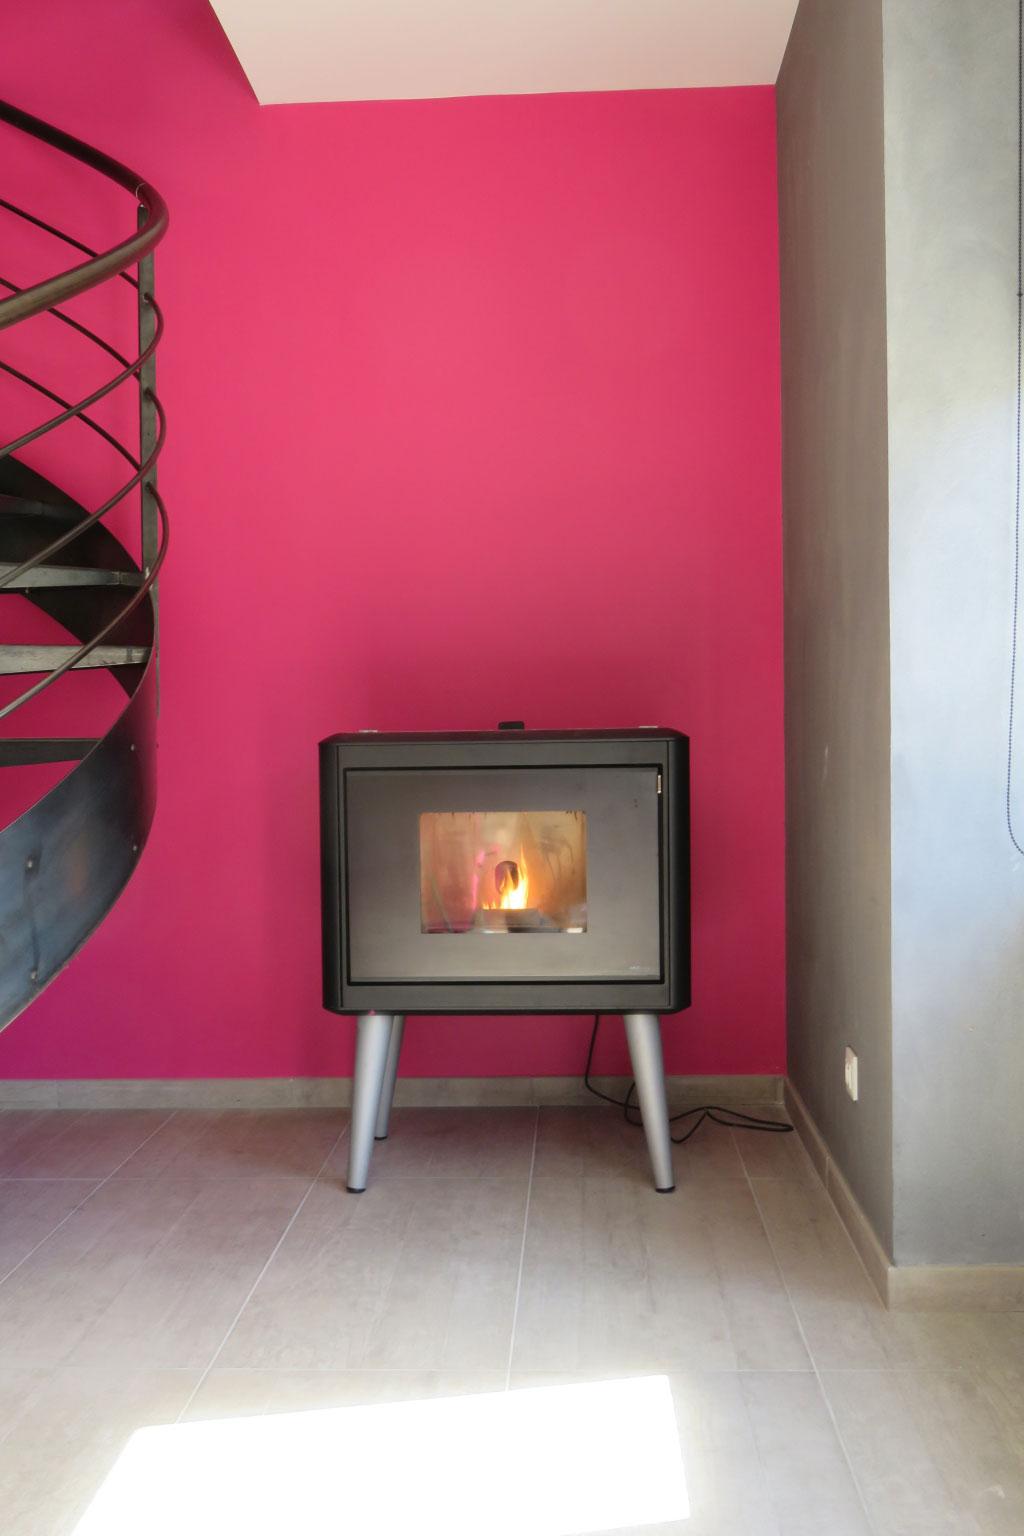 installation po le granul de bois pellets mcz mod le kama cessieu 38 is re cessieu 38. Black Bedroom Furniture Sets. Home Design Ideas